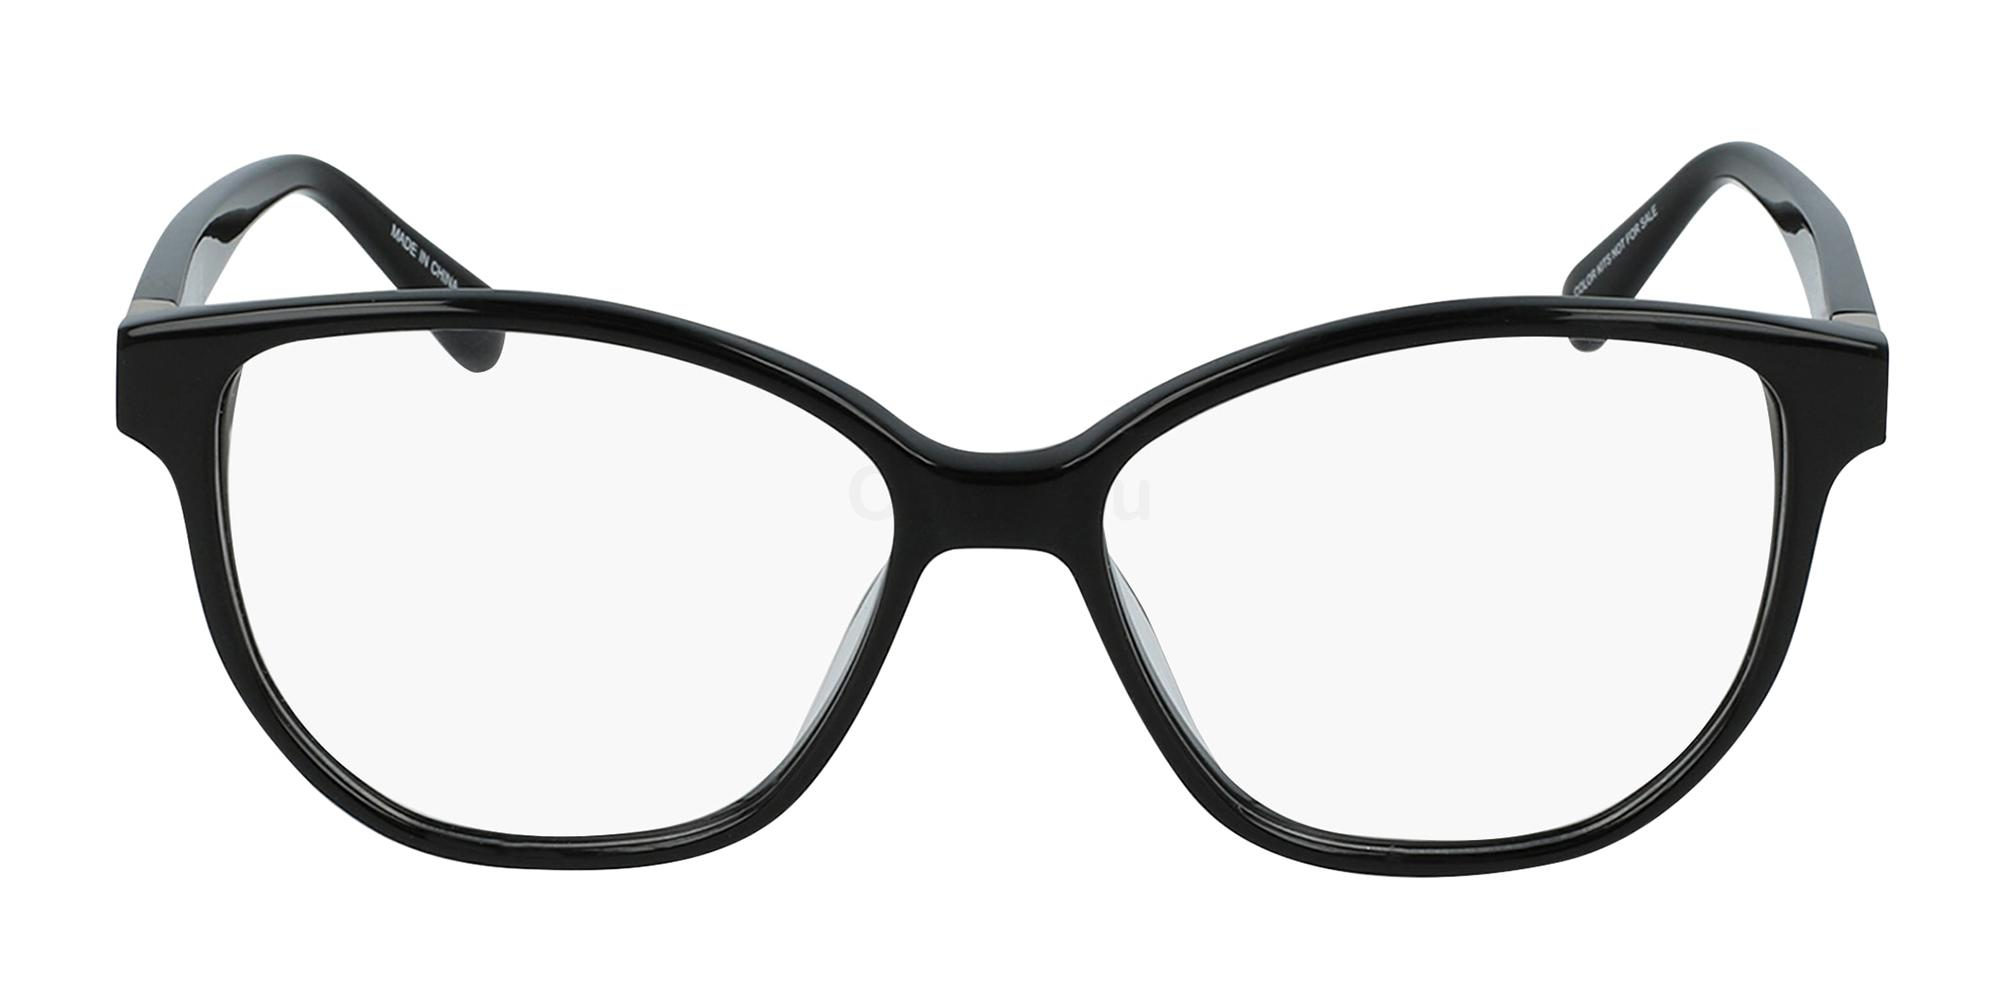 001 LO2663 Glasses, LONGCHAMP